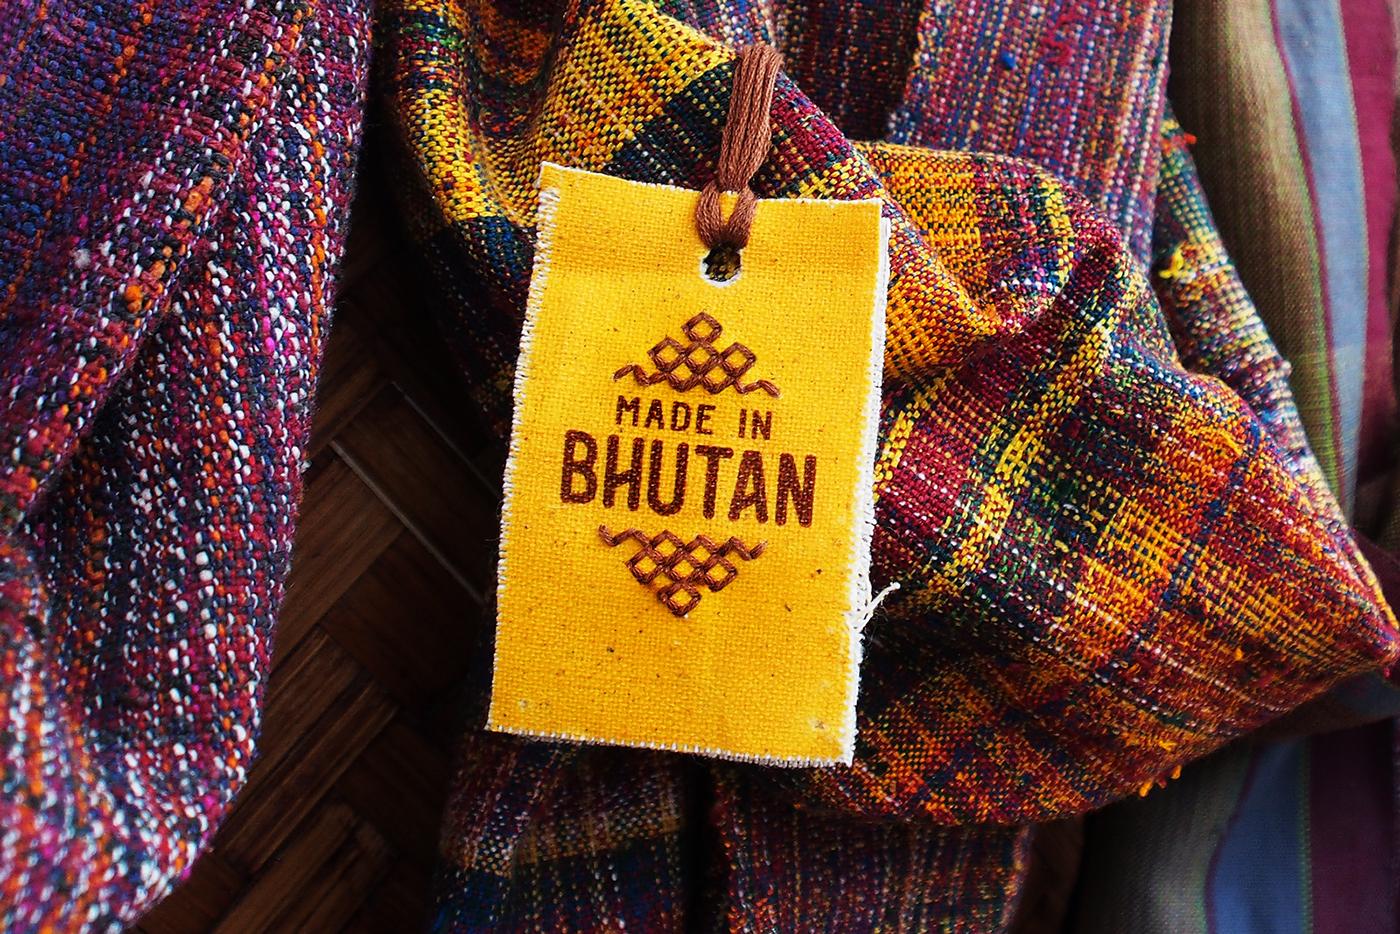 Bhutan_9_MadeIn